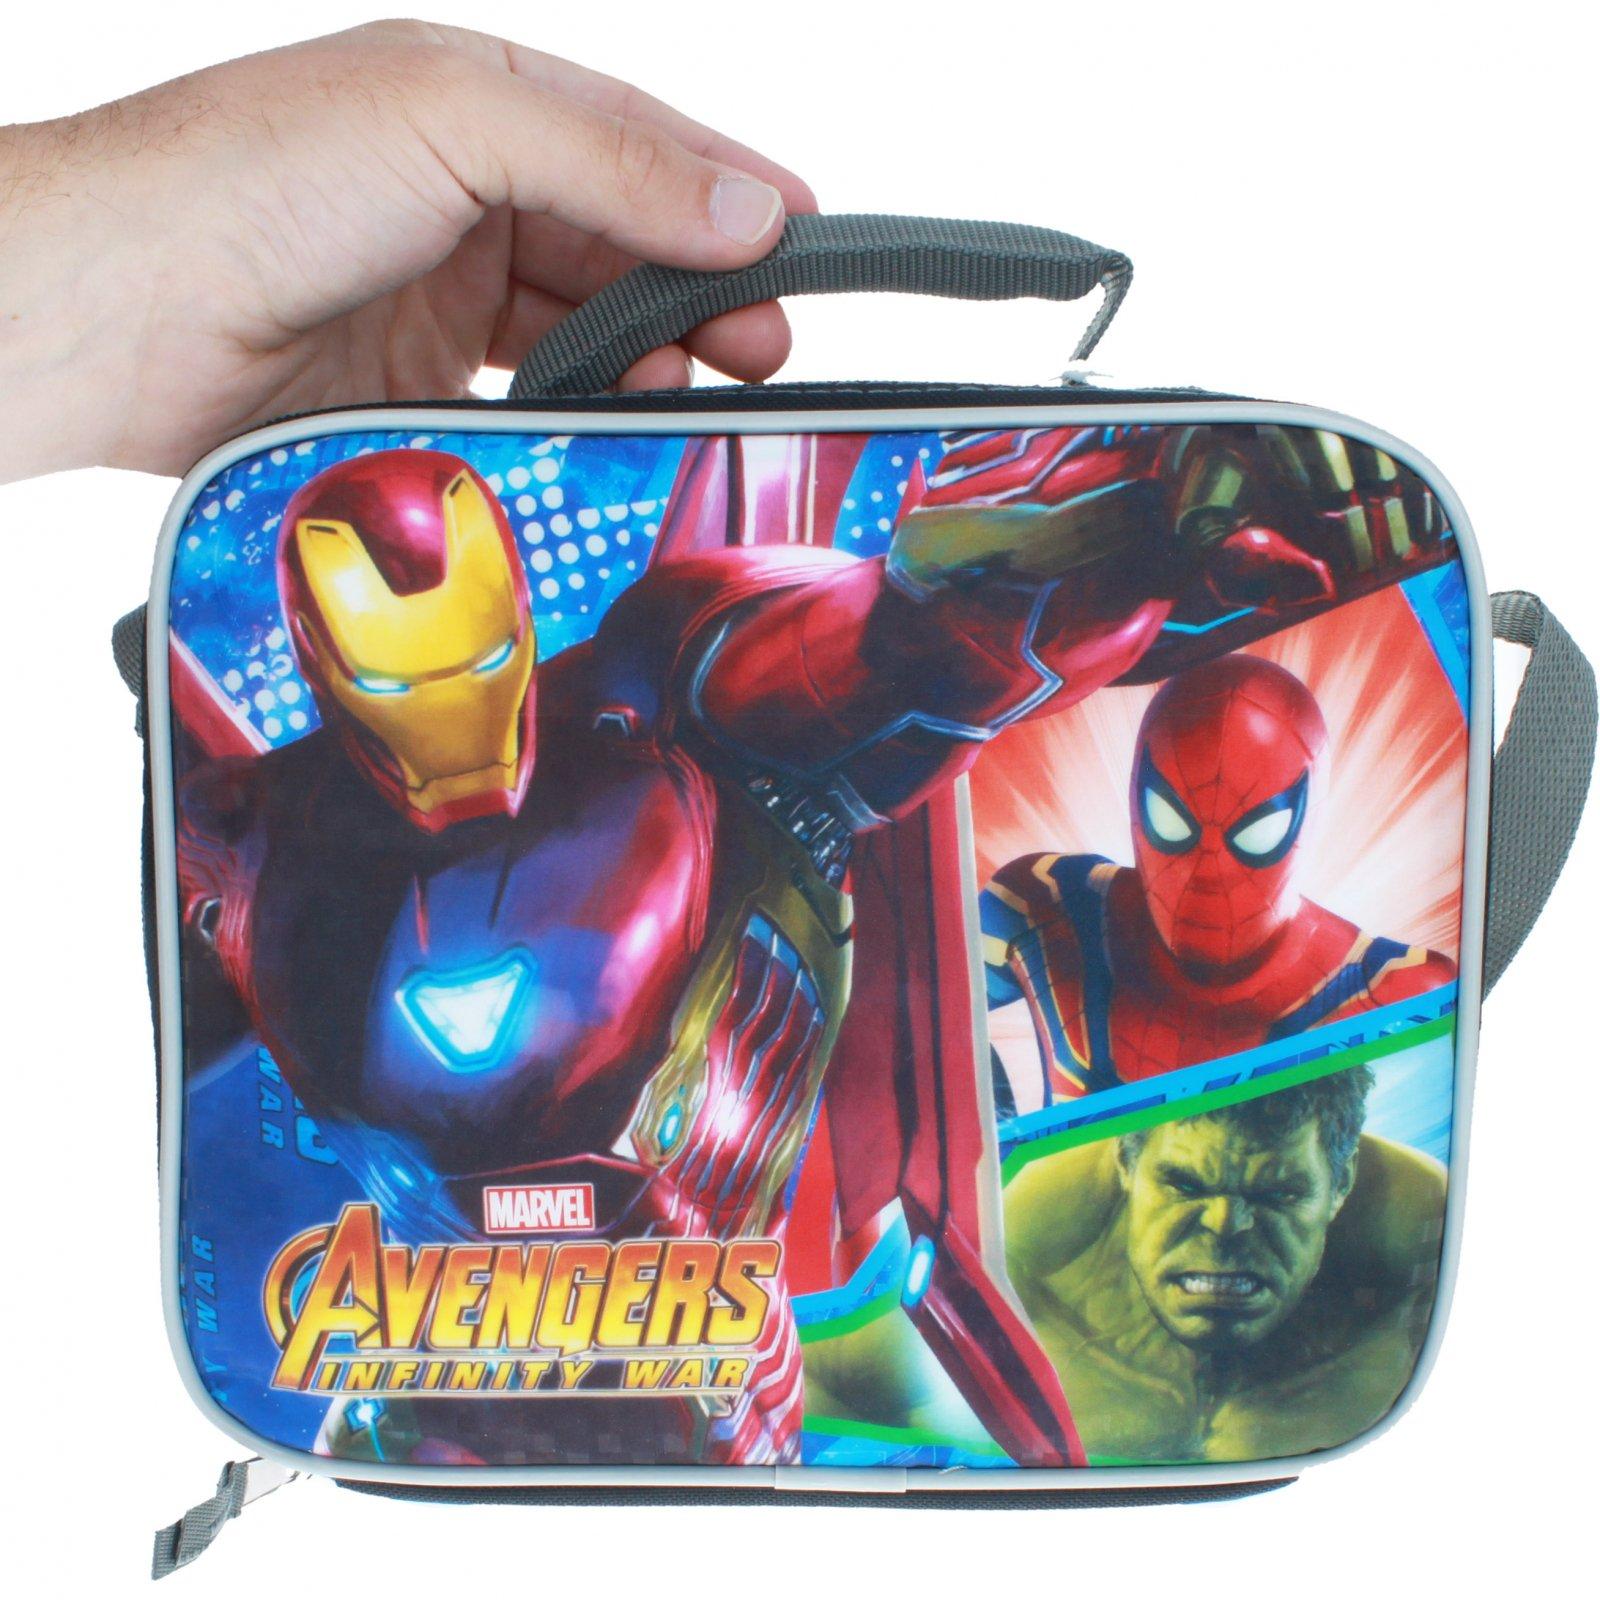 Disney Marvel Avengers Infinity War Graphic Lunch Bag